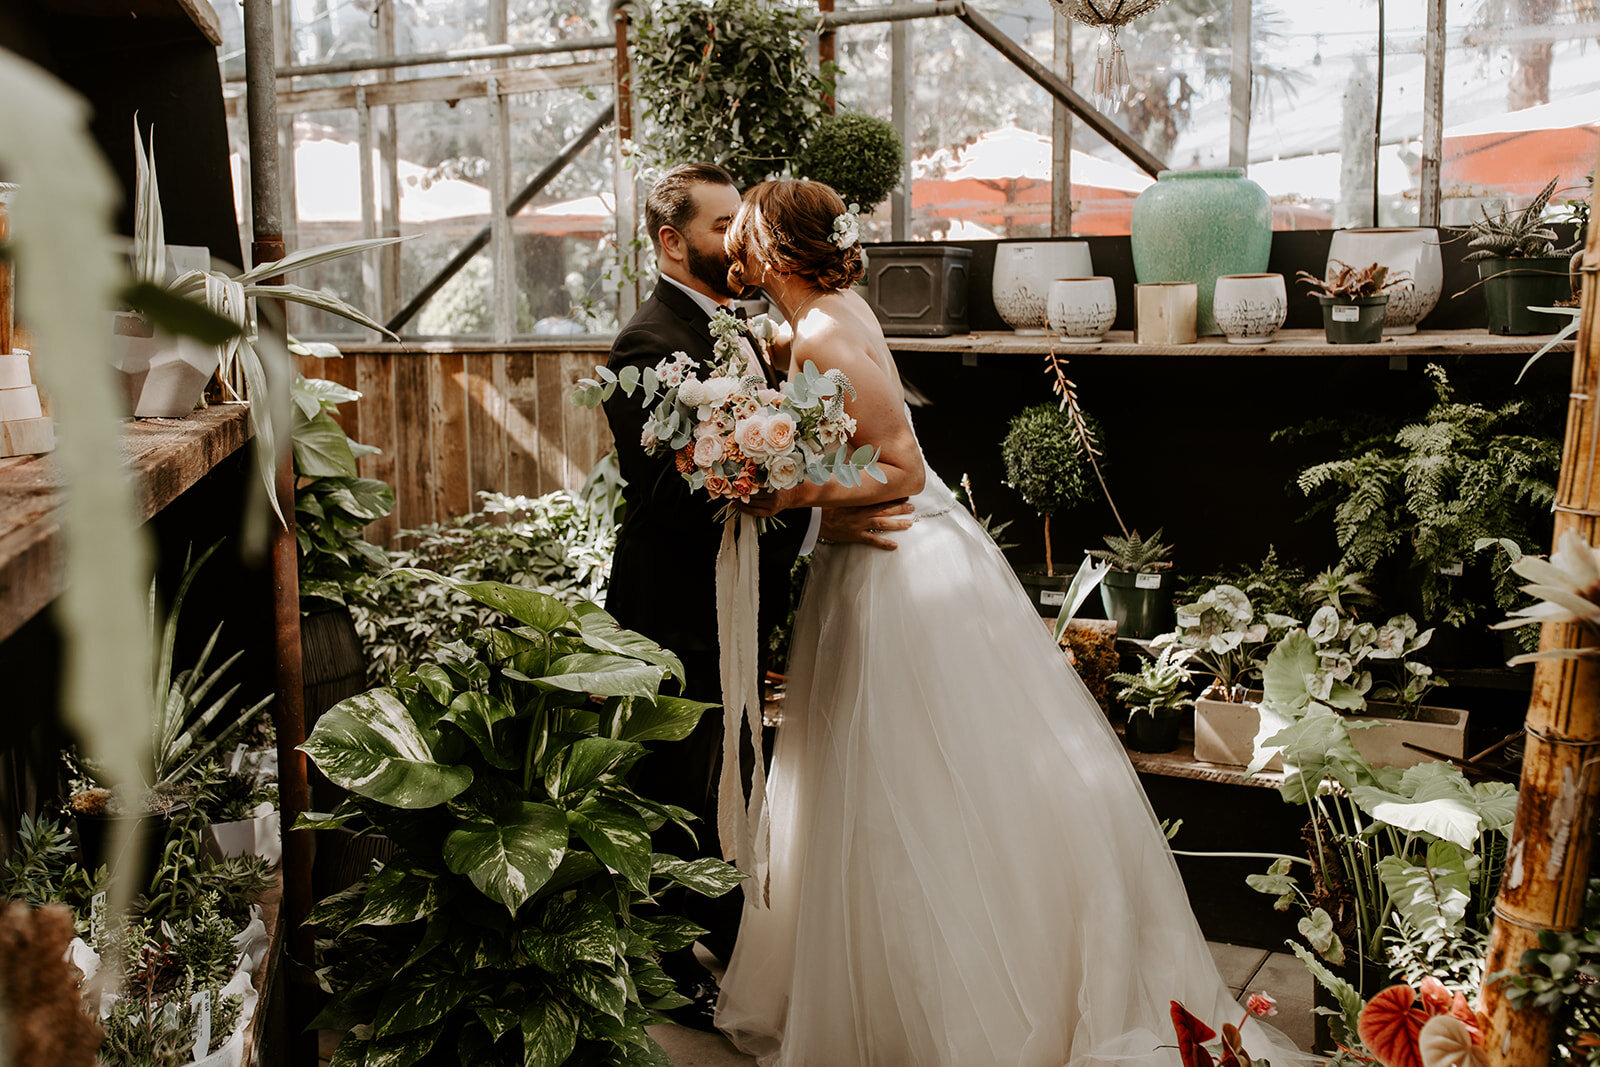 blockhouse-nursery-intimate-wedding-18.jpg